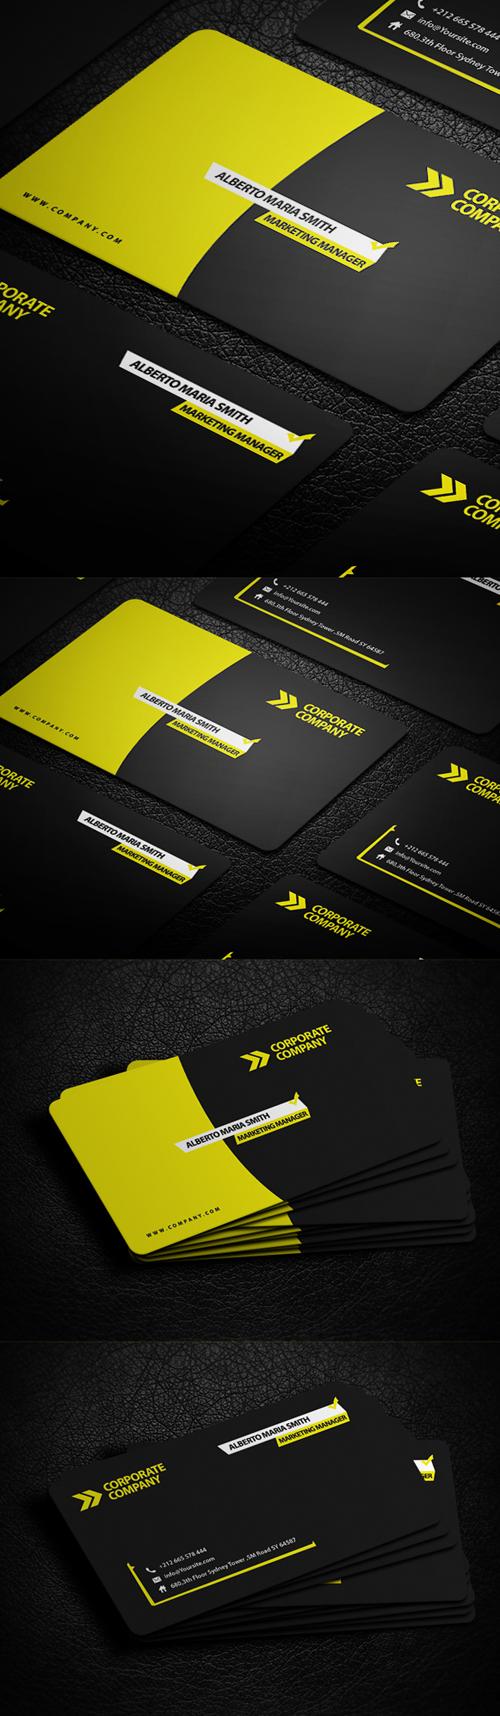 business cards template design - 11